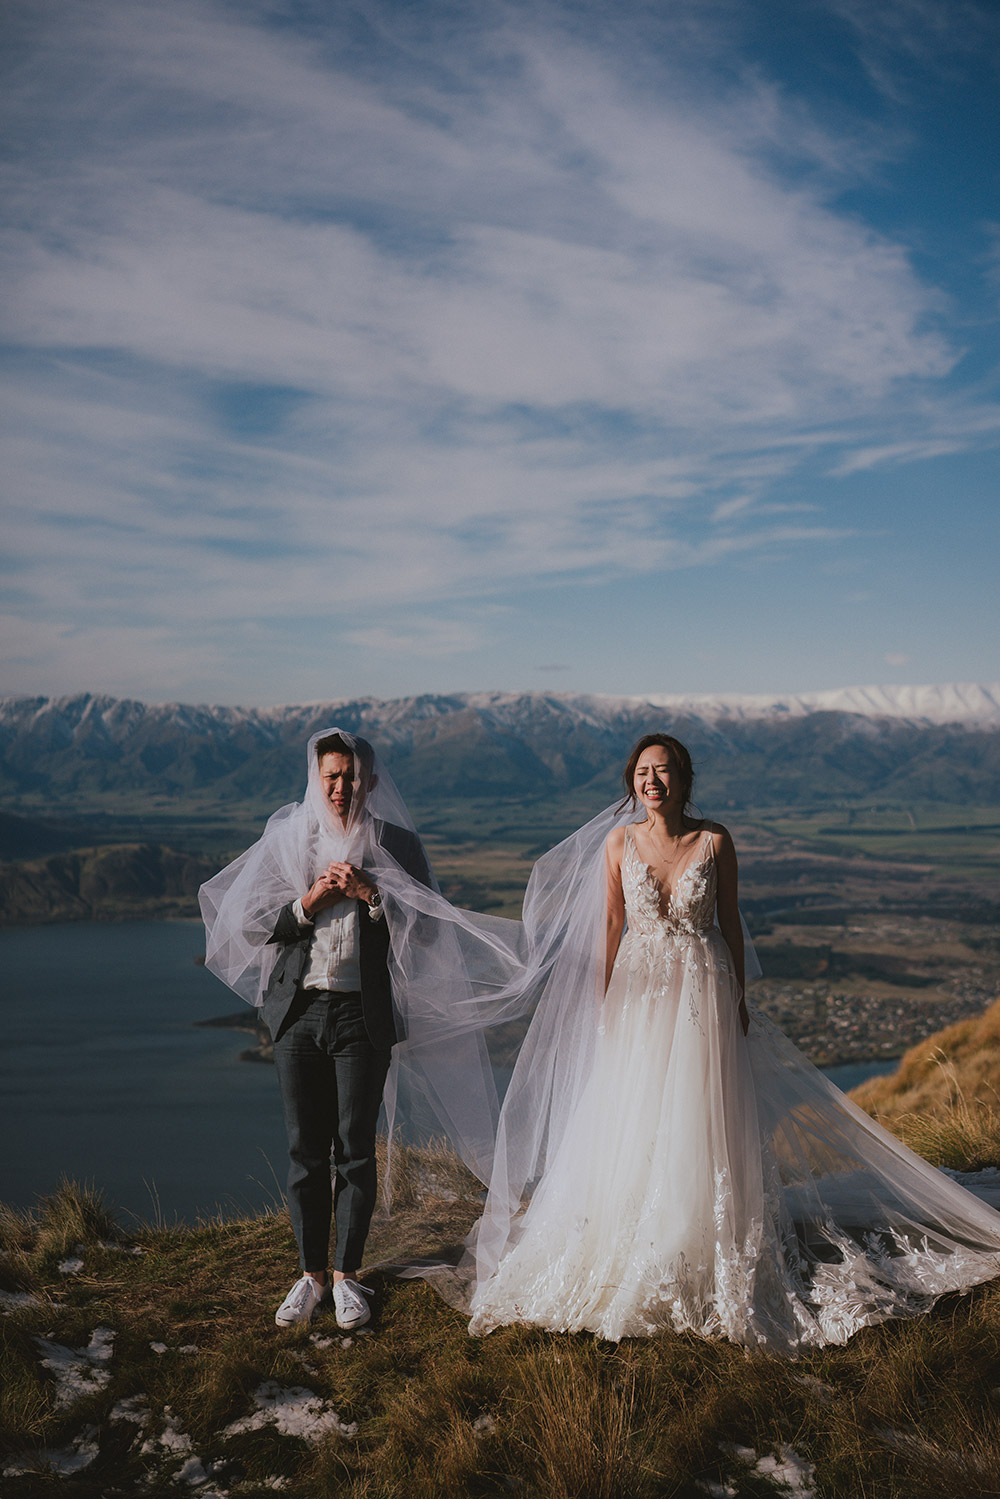 New Zealand bridal portraits. Multifolds Photography. www.theweddingnotebook.com